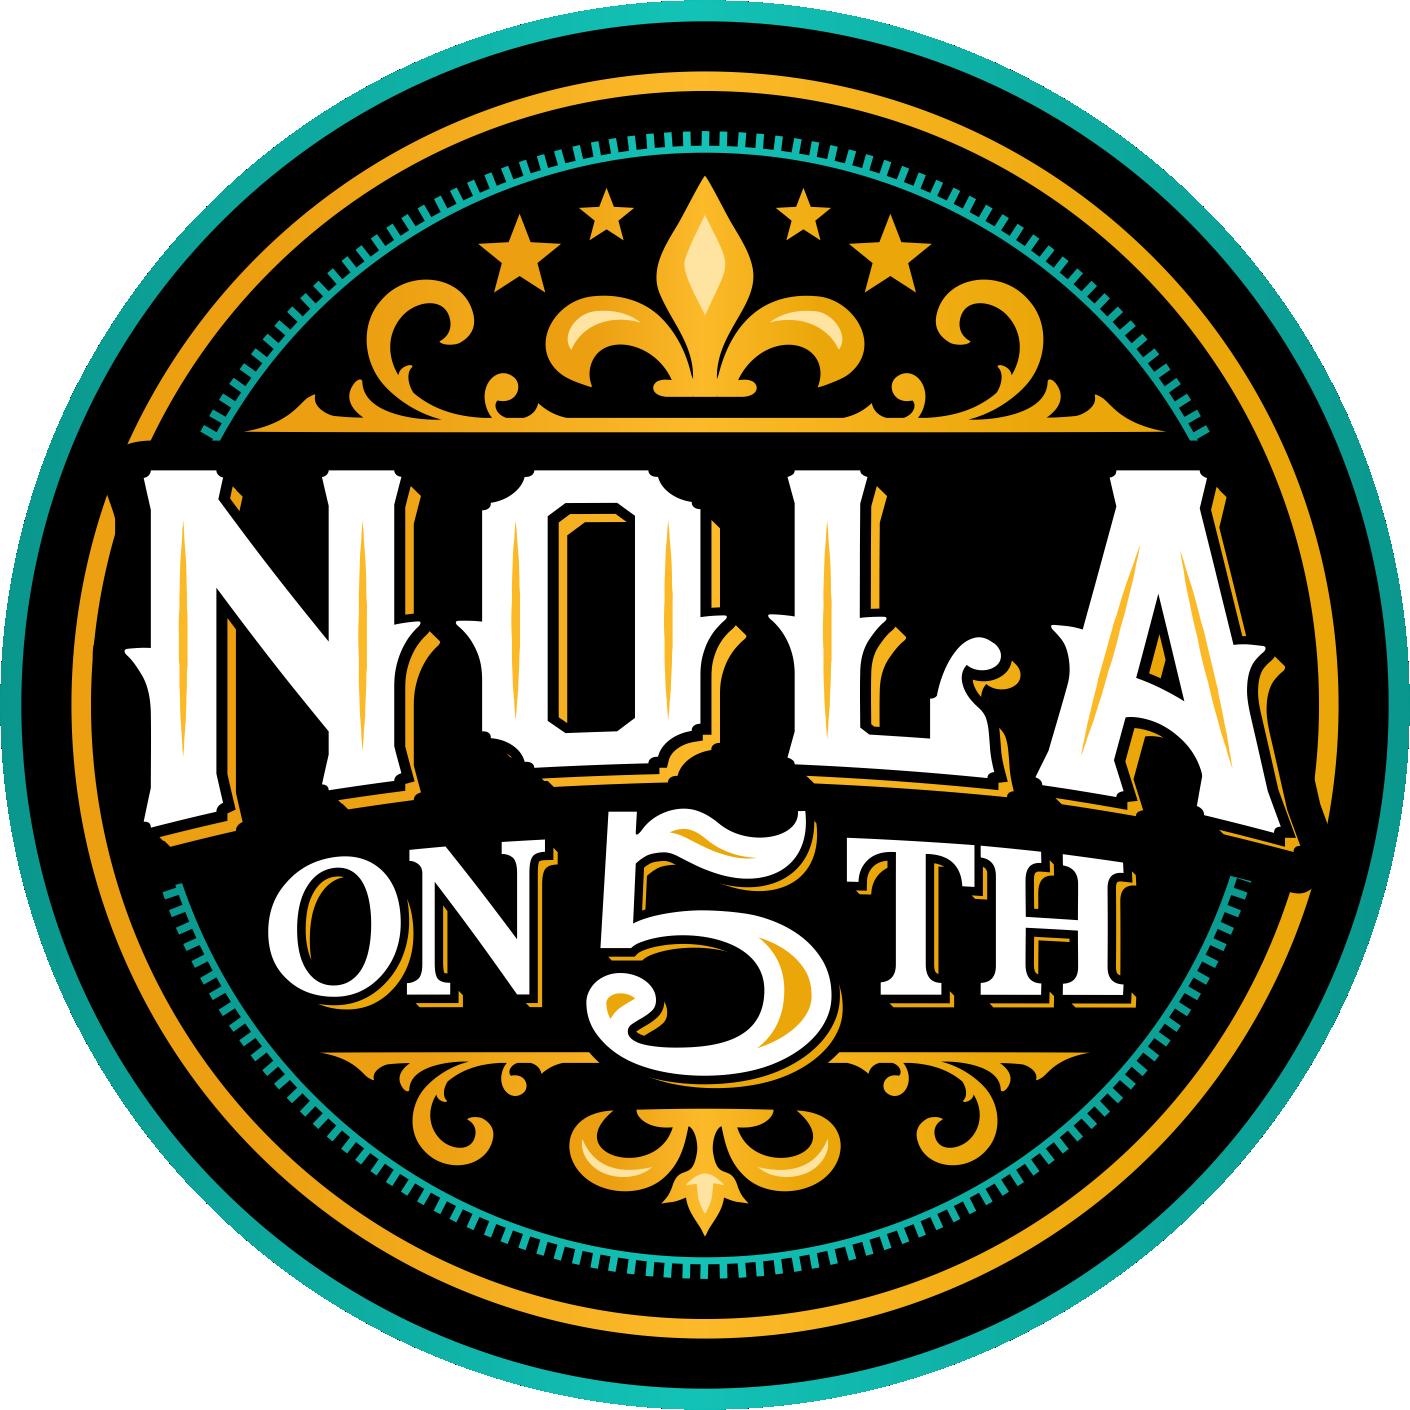 Nola On 5th logo